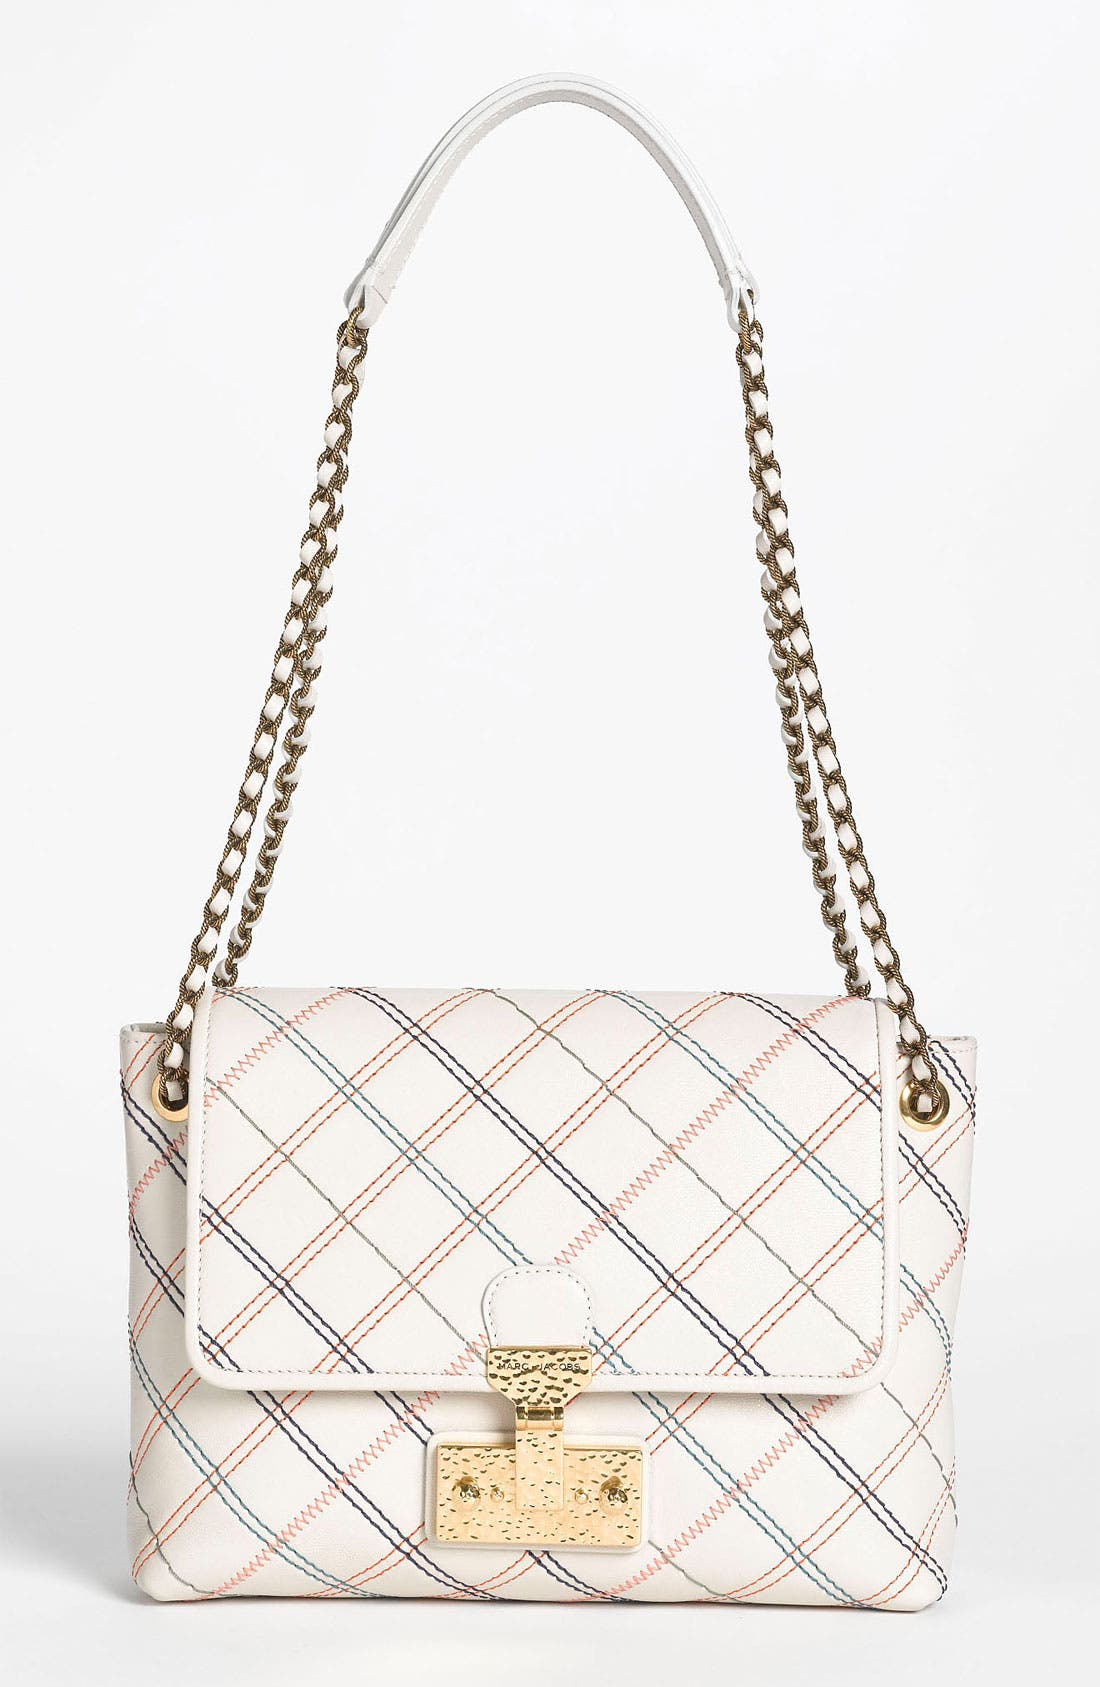 Main Image - MARC JACOBS 'Multistitch Single - Large' Leather Shoulder Bag